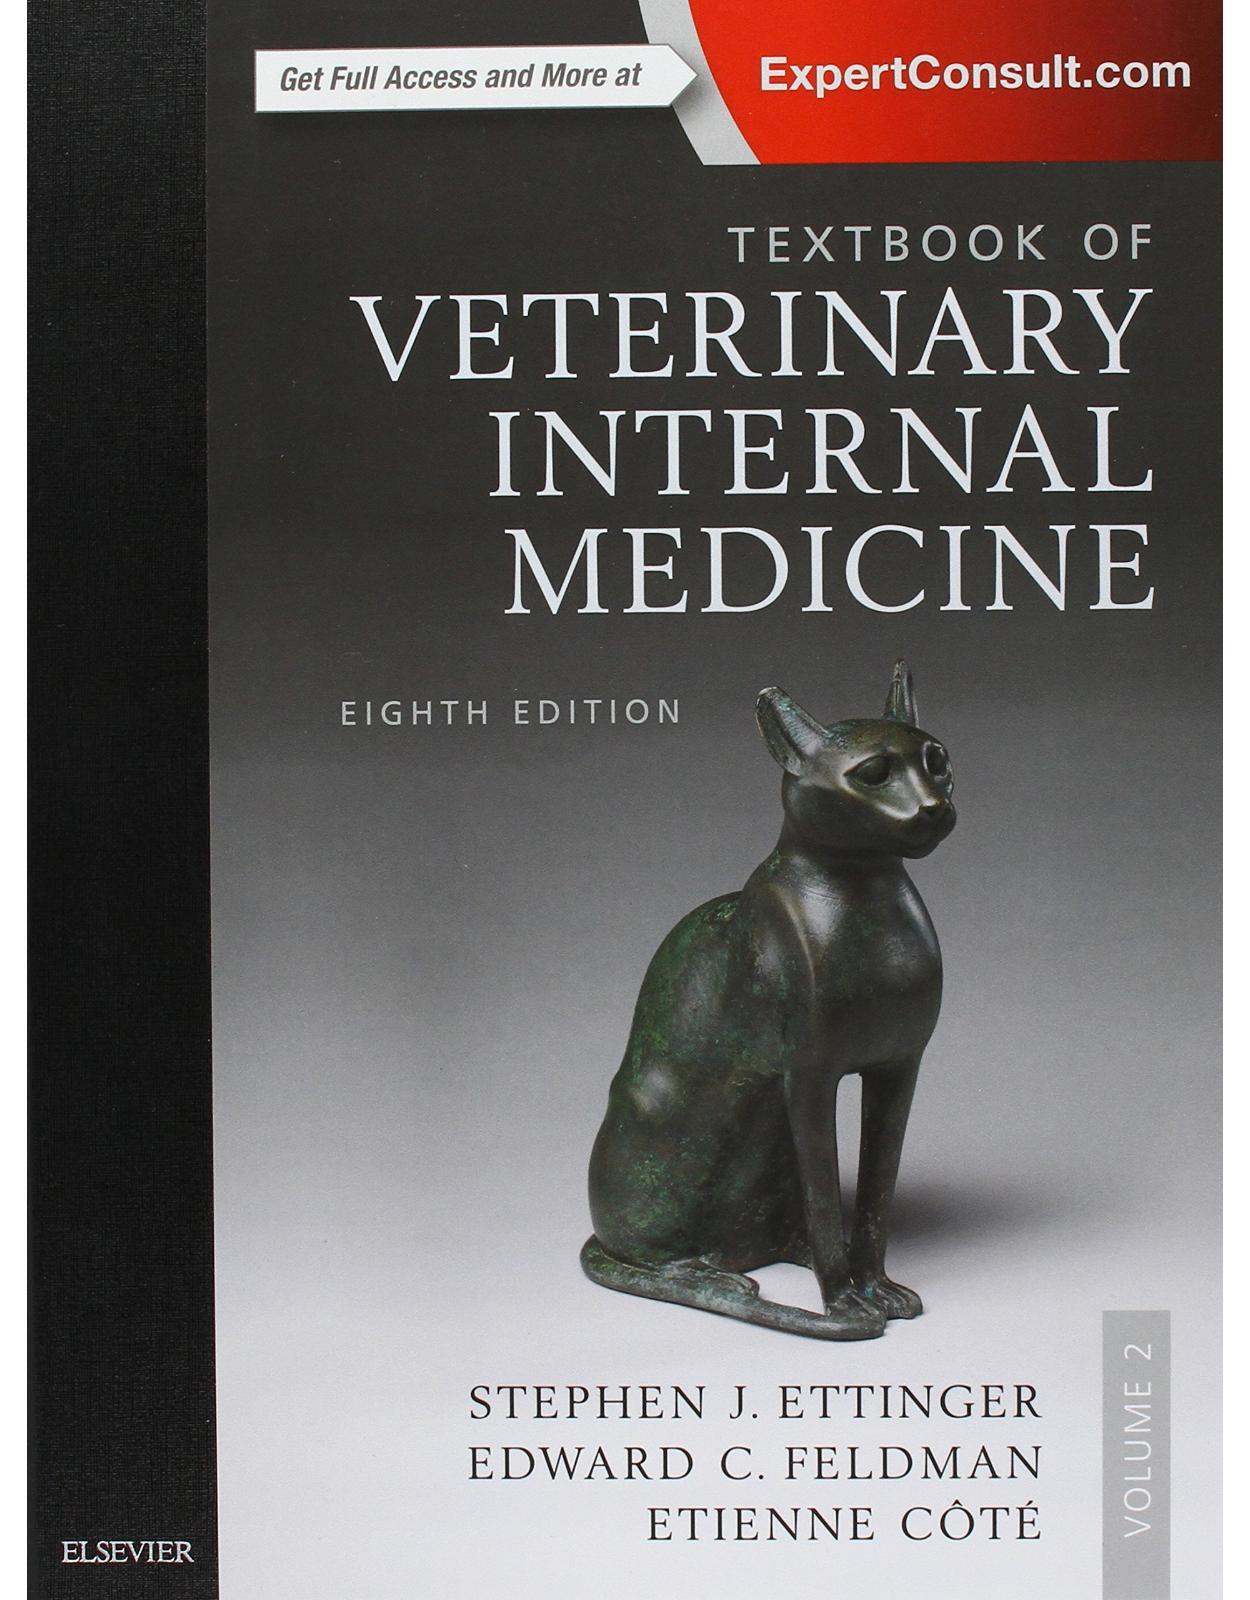 Textbook of Veterinary Internal Medicine Expert Consult, 8th Edition